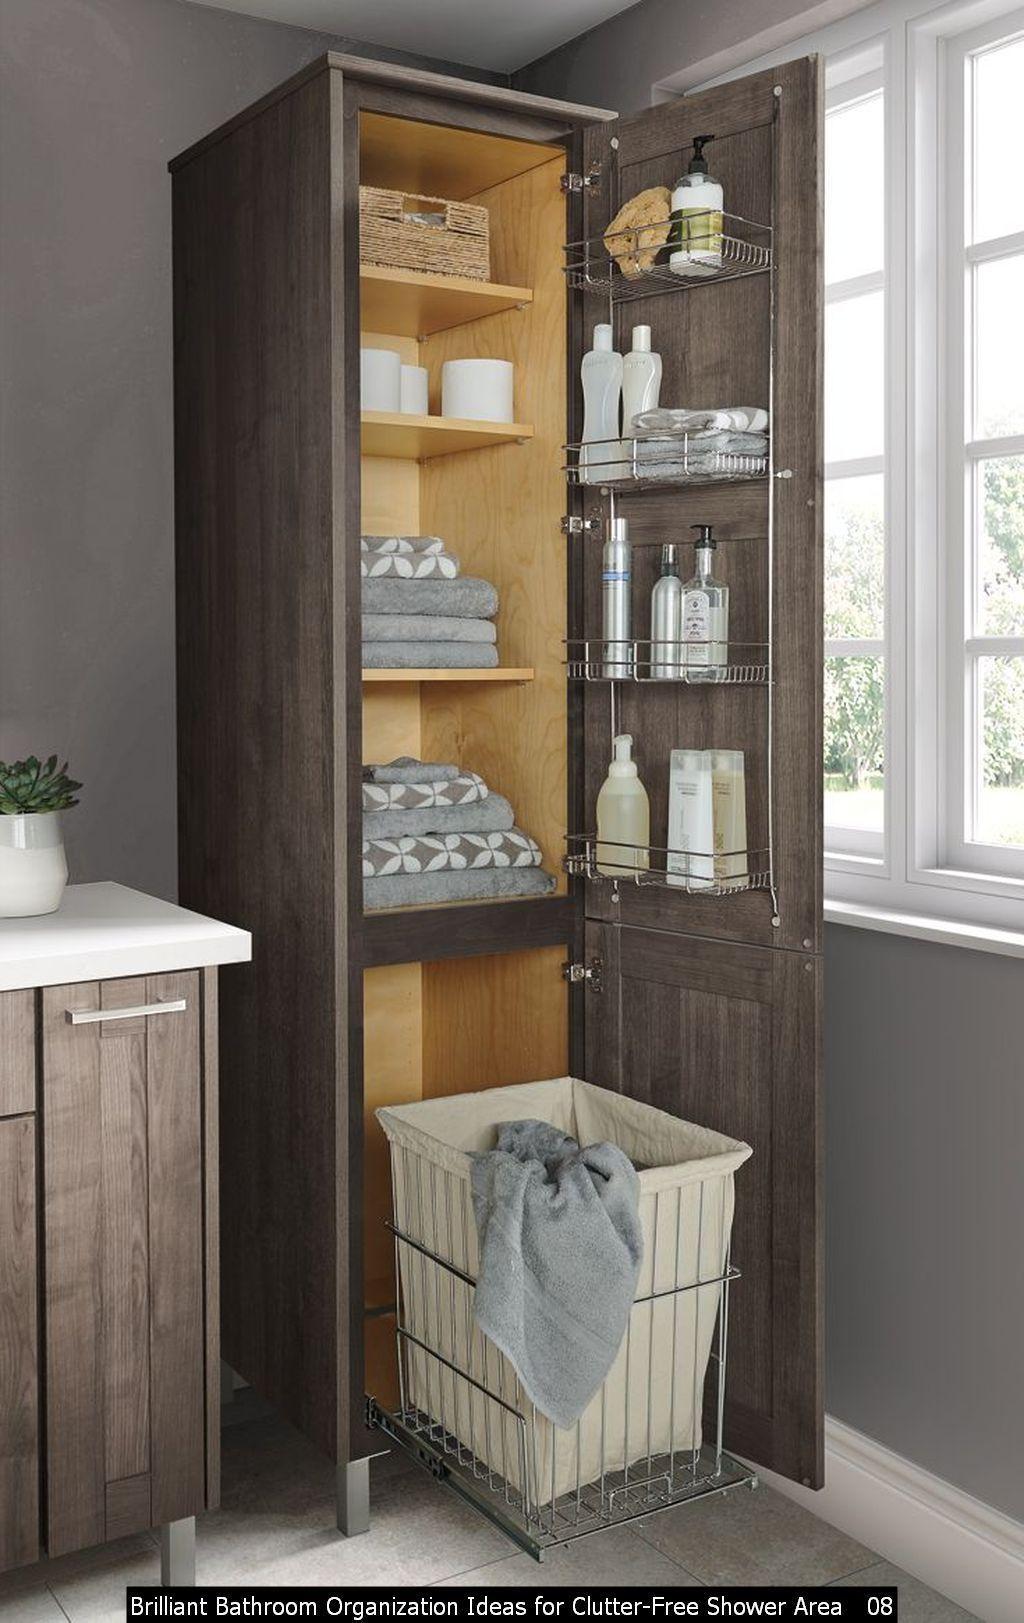 Stunning and Brilliant Bathroom Organization Ideas for ... on Small Area Bathroom Ideas  id=45549